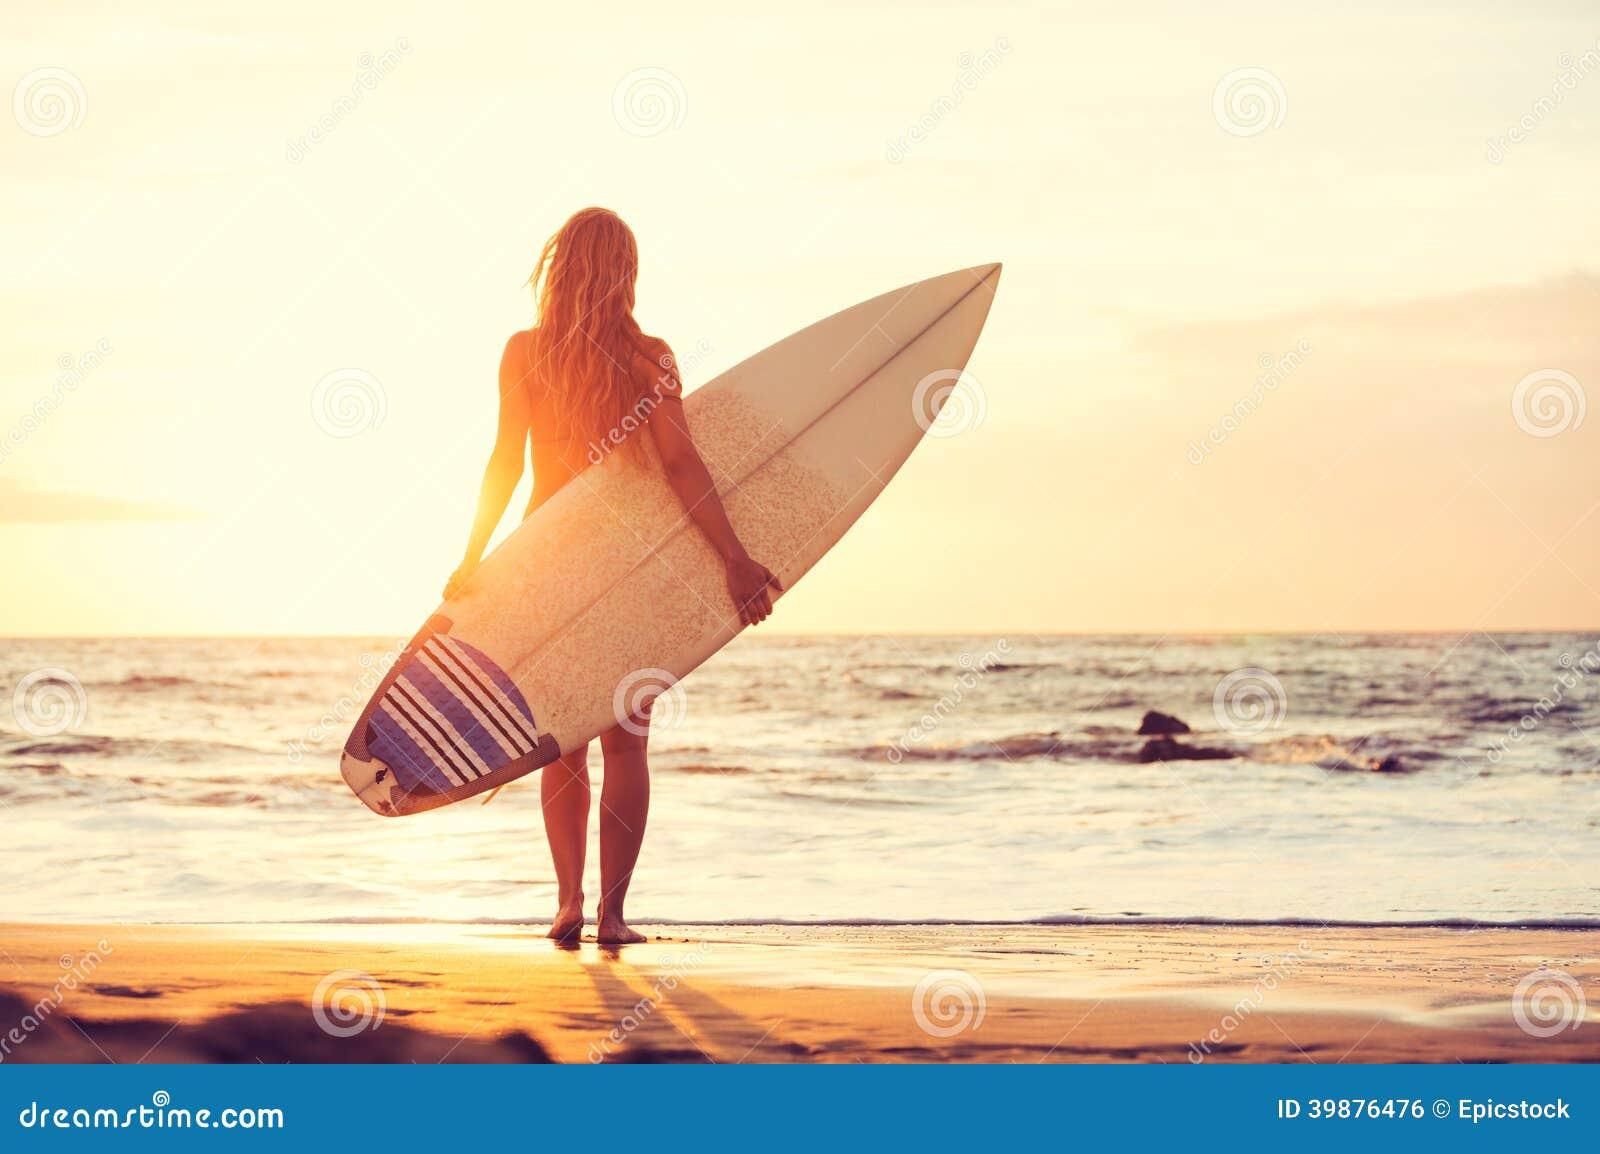 Surfer Girl Surfboard